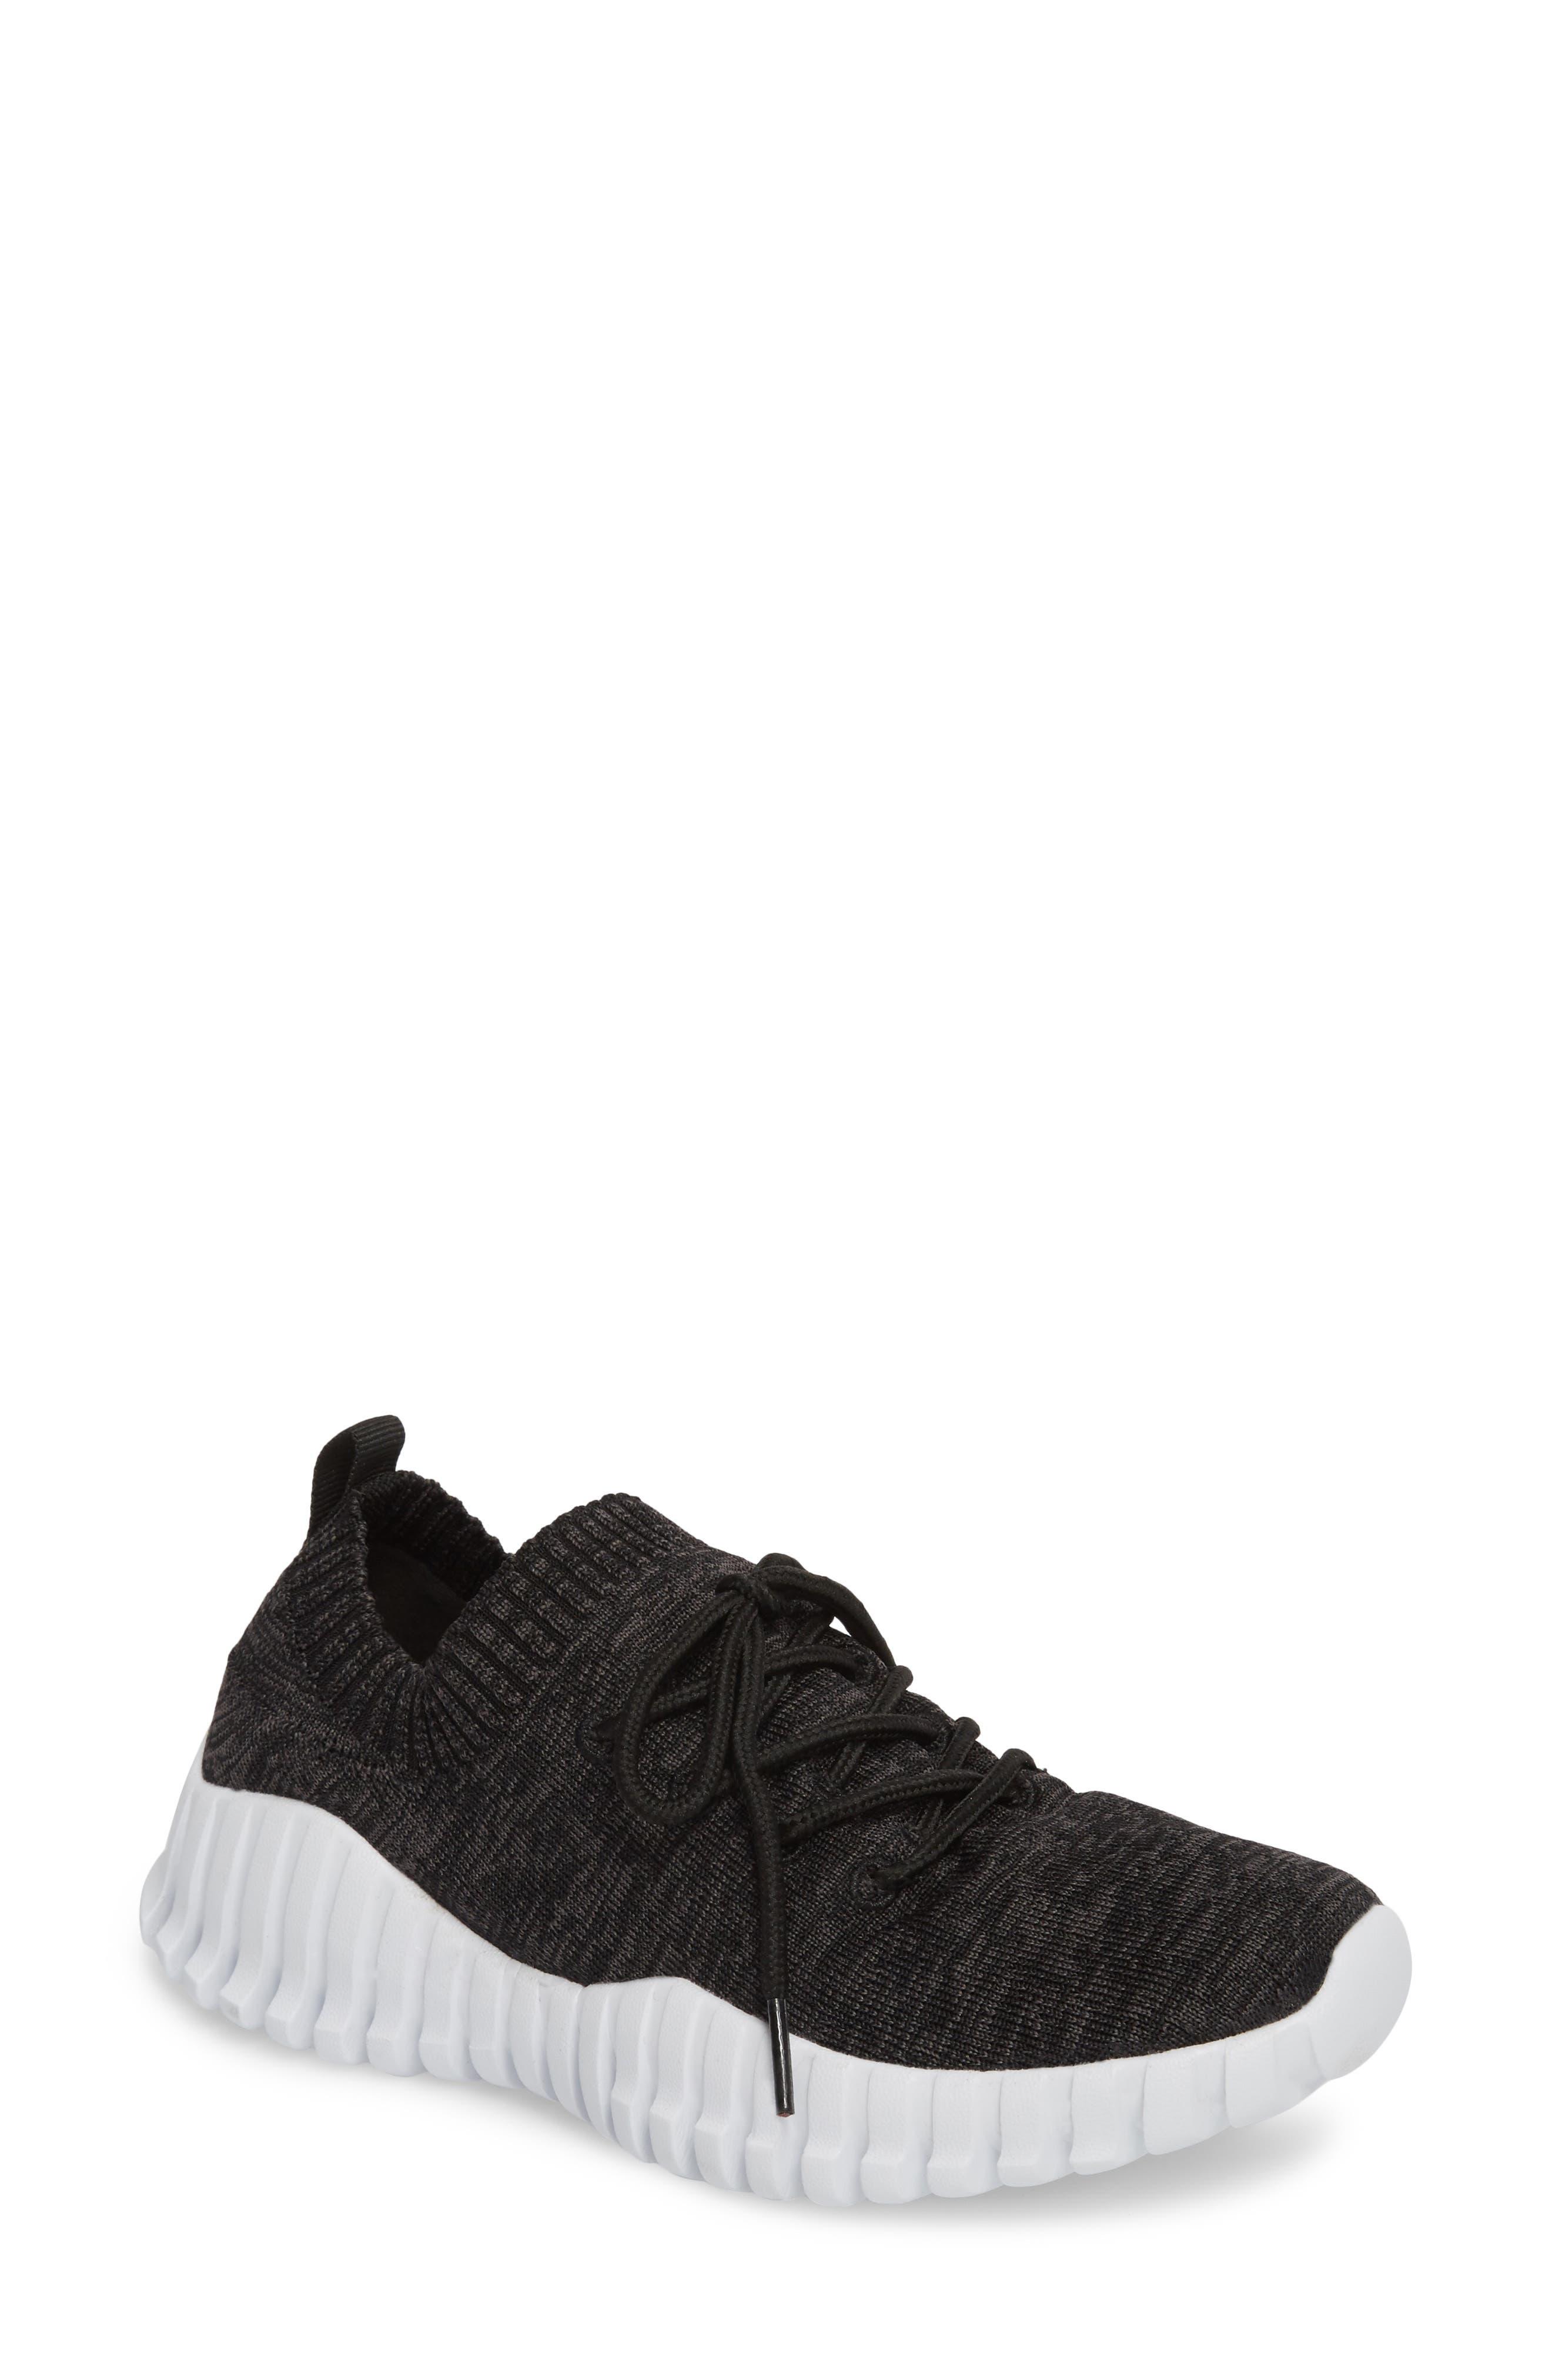 Gravity Sneaker,                         Main,                         color, BLACK GREY